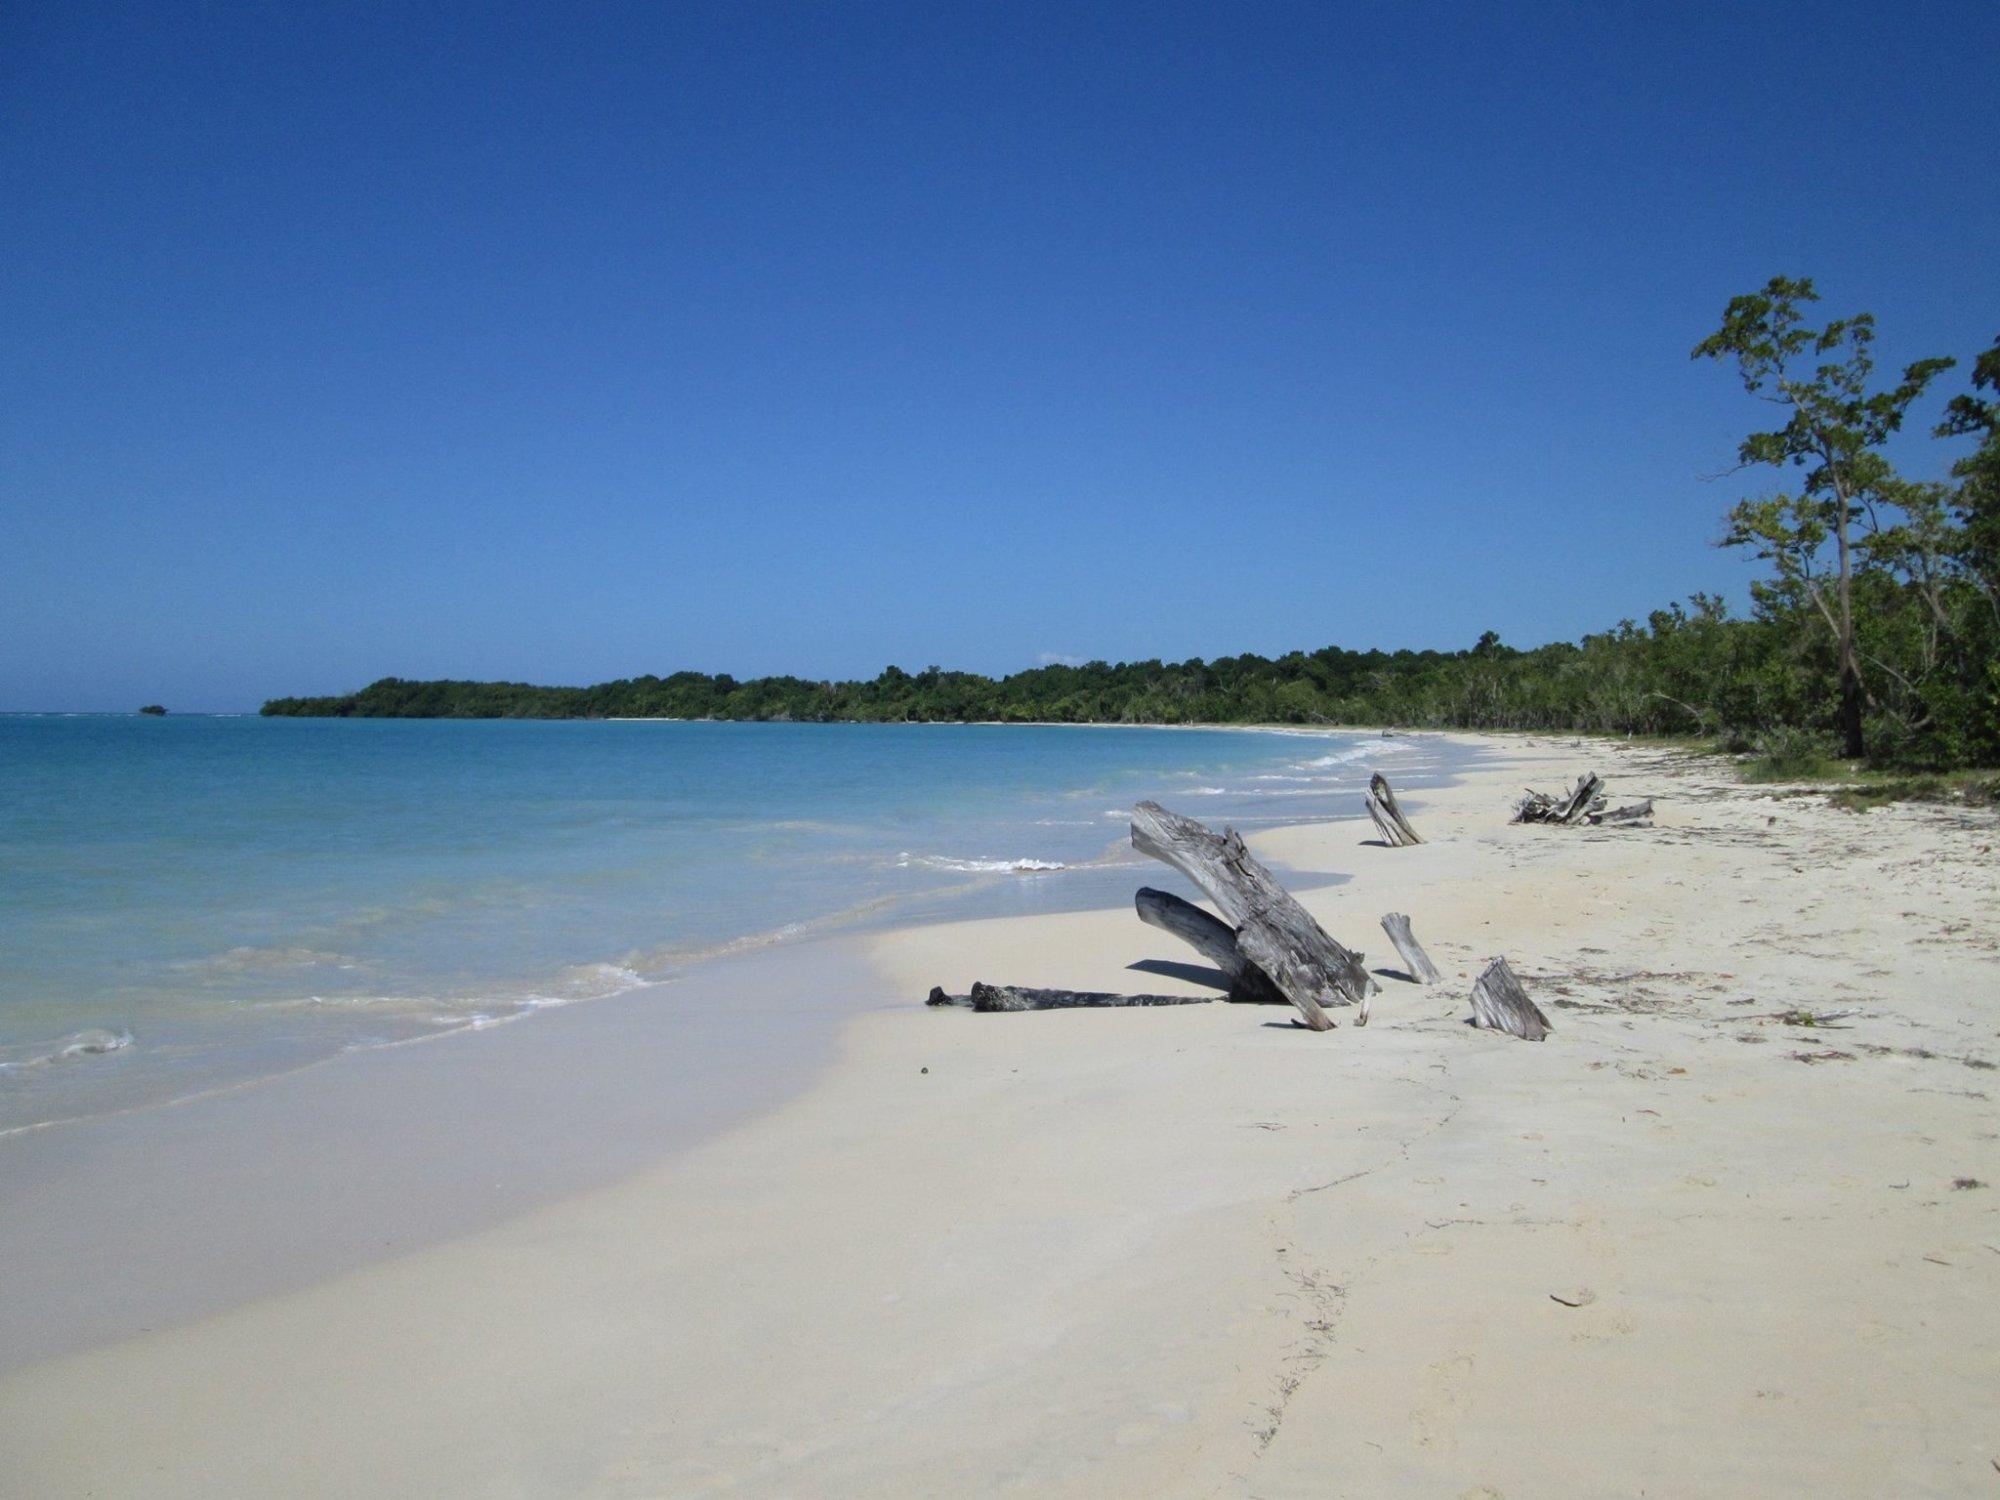 Beach just beyond Sandals Whitehouse, Jamaica